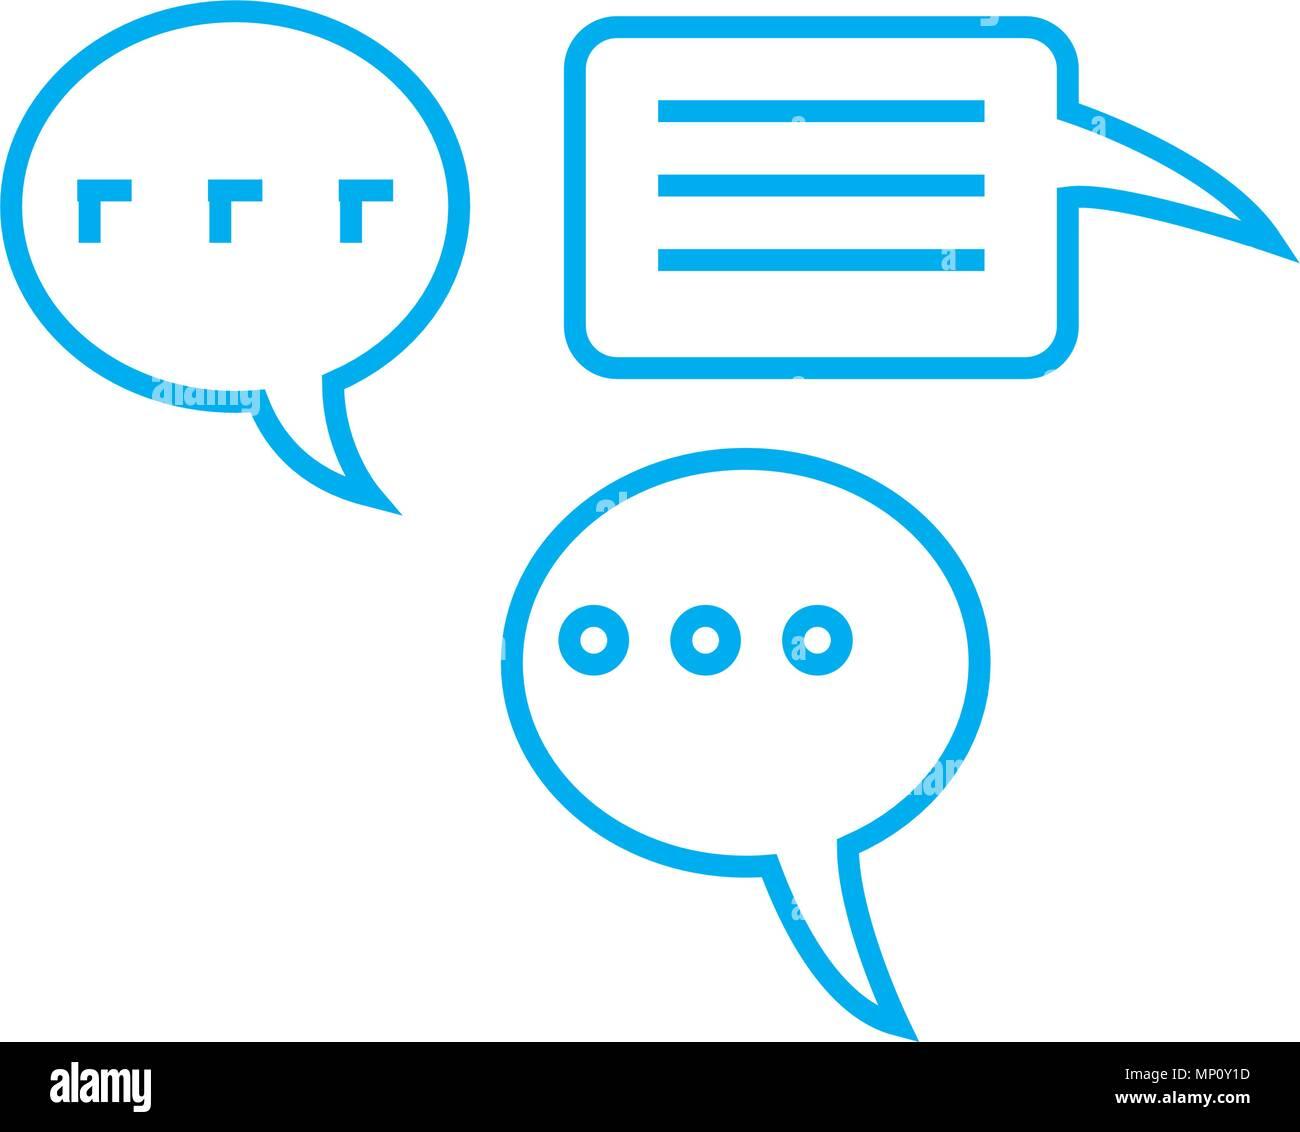 Employees' feedback linear icon concept. Employees' feedback line vector sign, symbol, illustration. Stock Vector